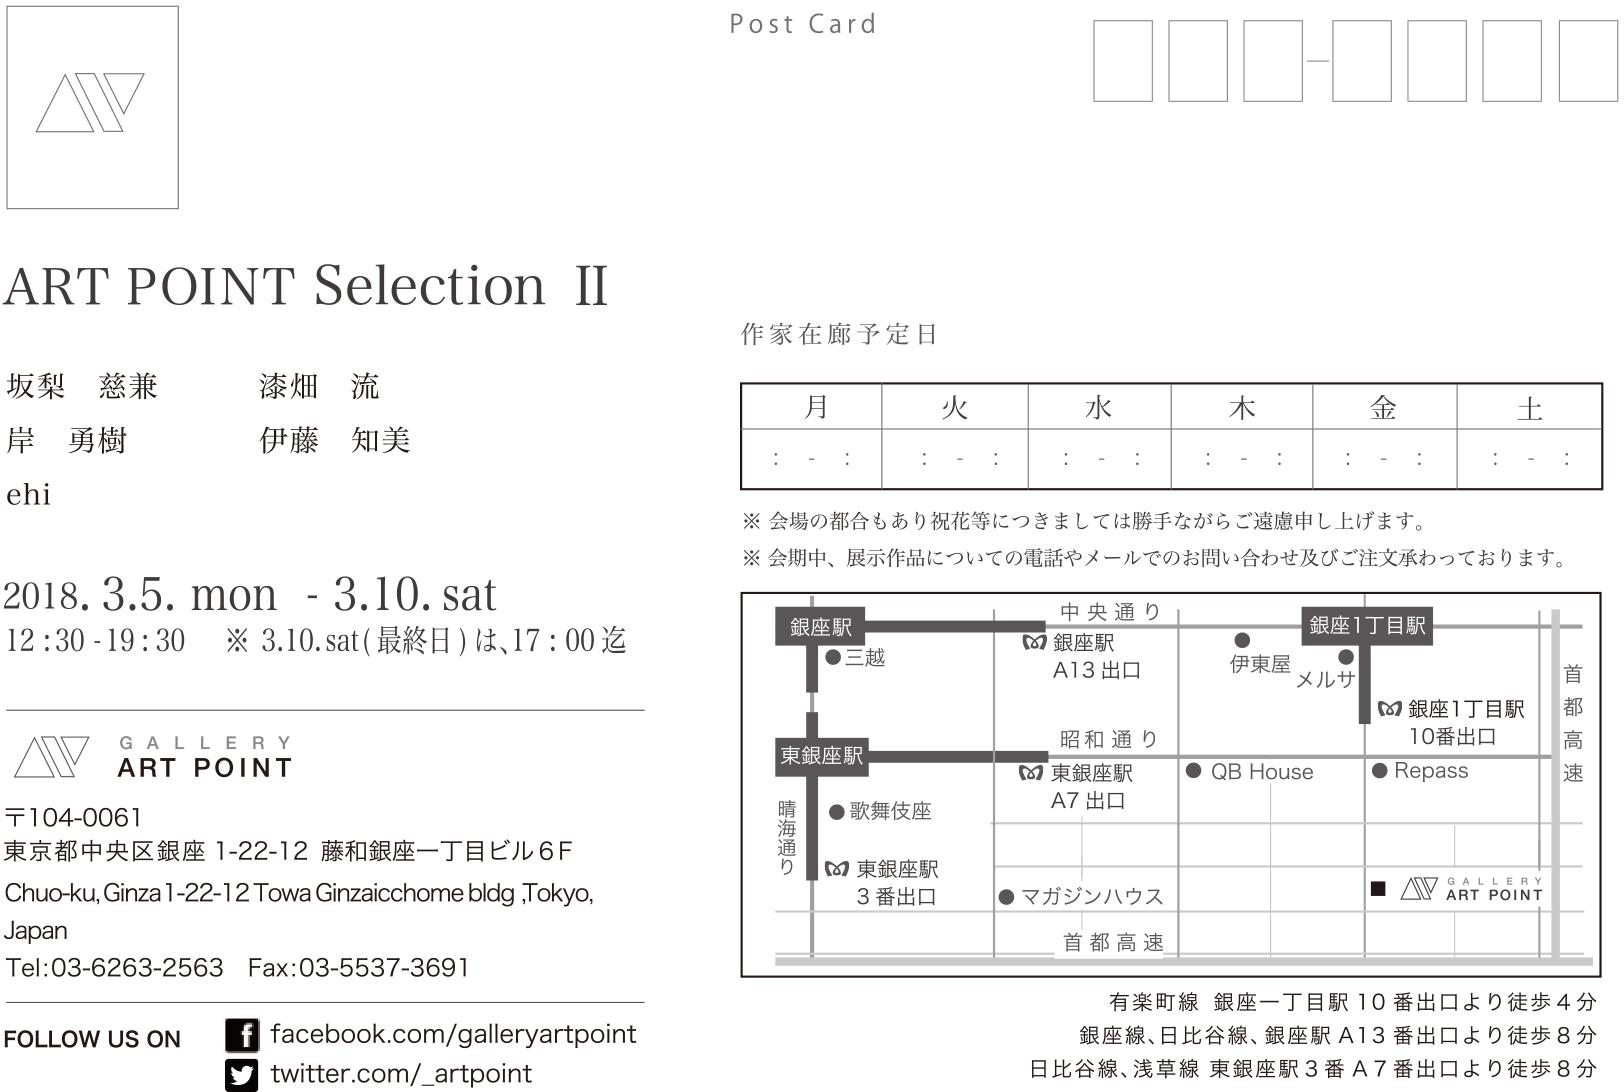 DM-APS Ⅱ2018-宛名面OL